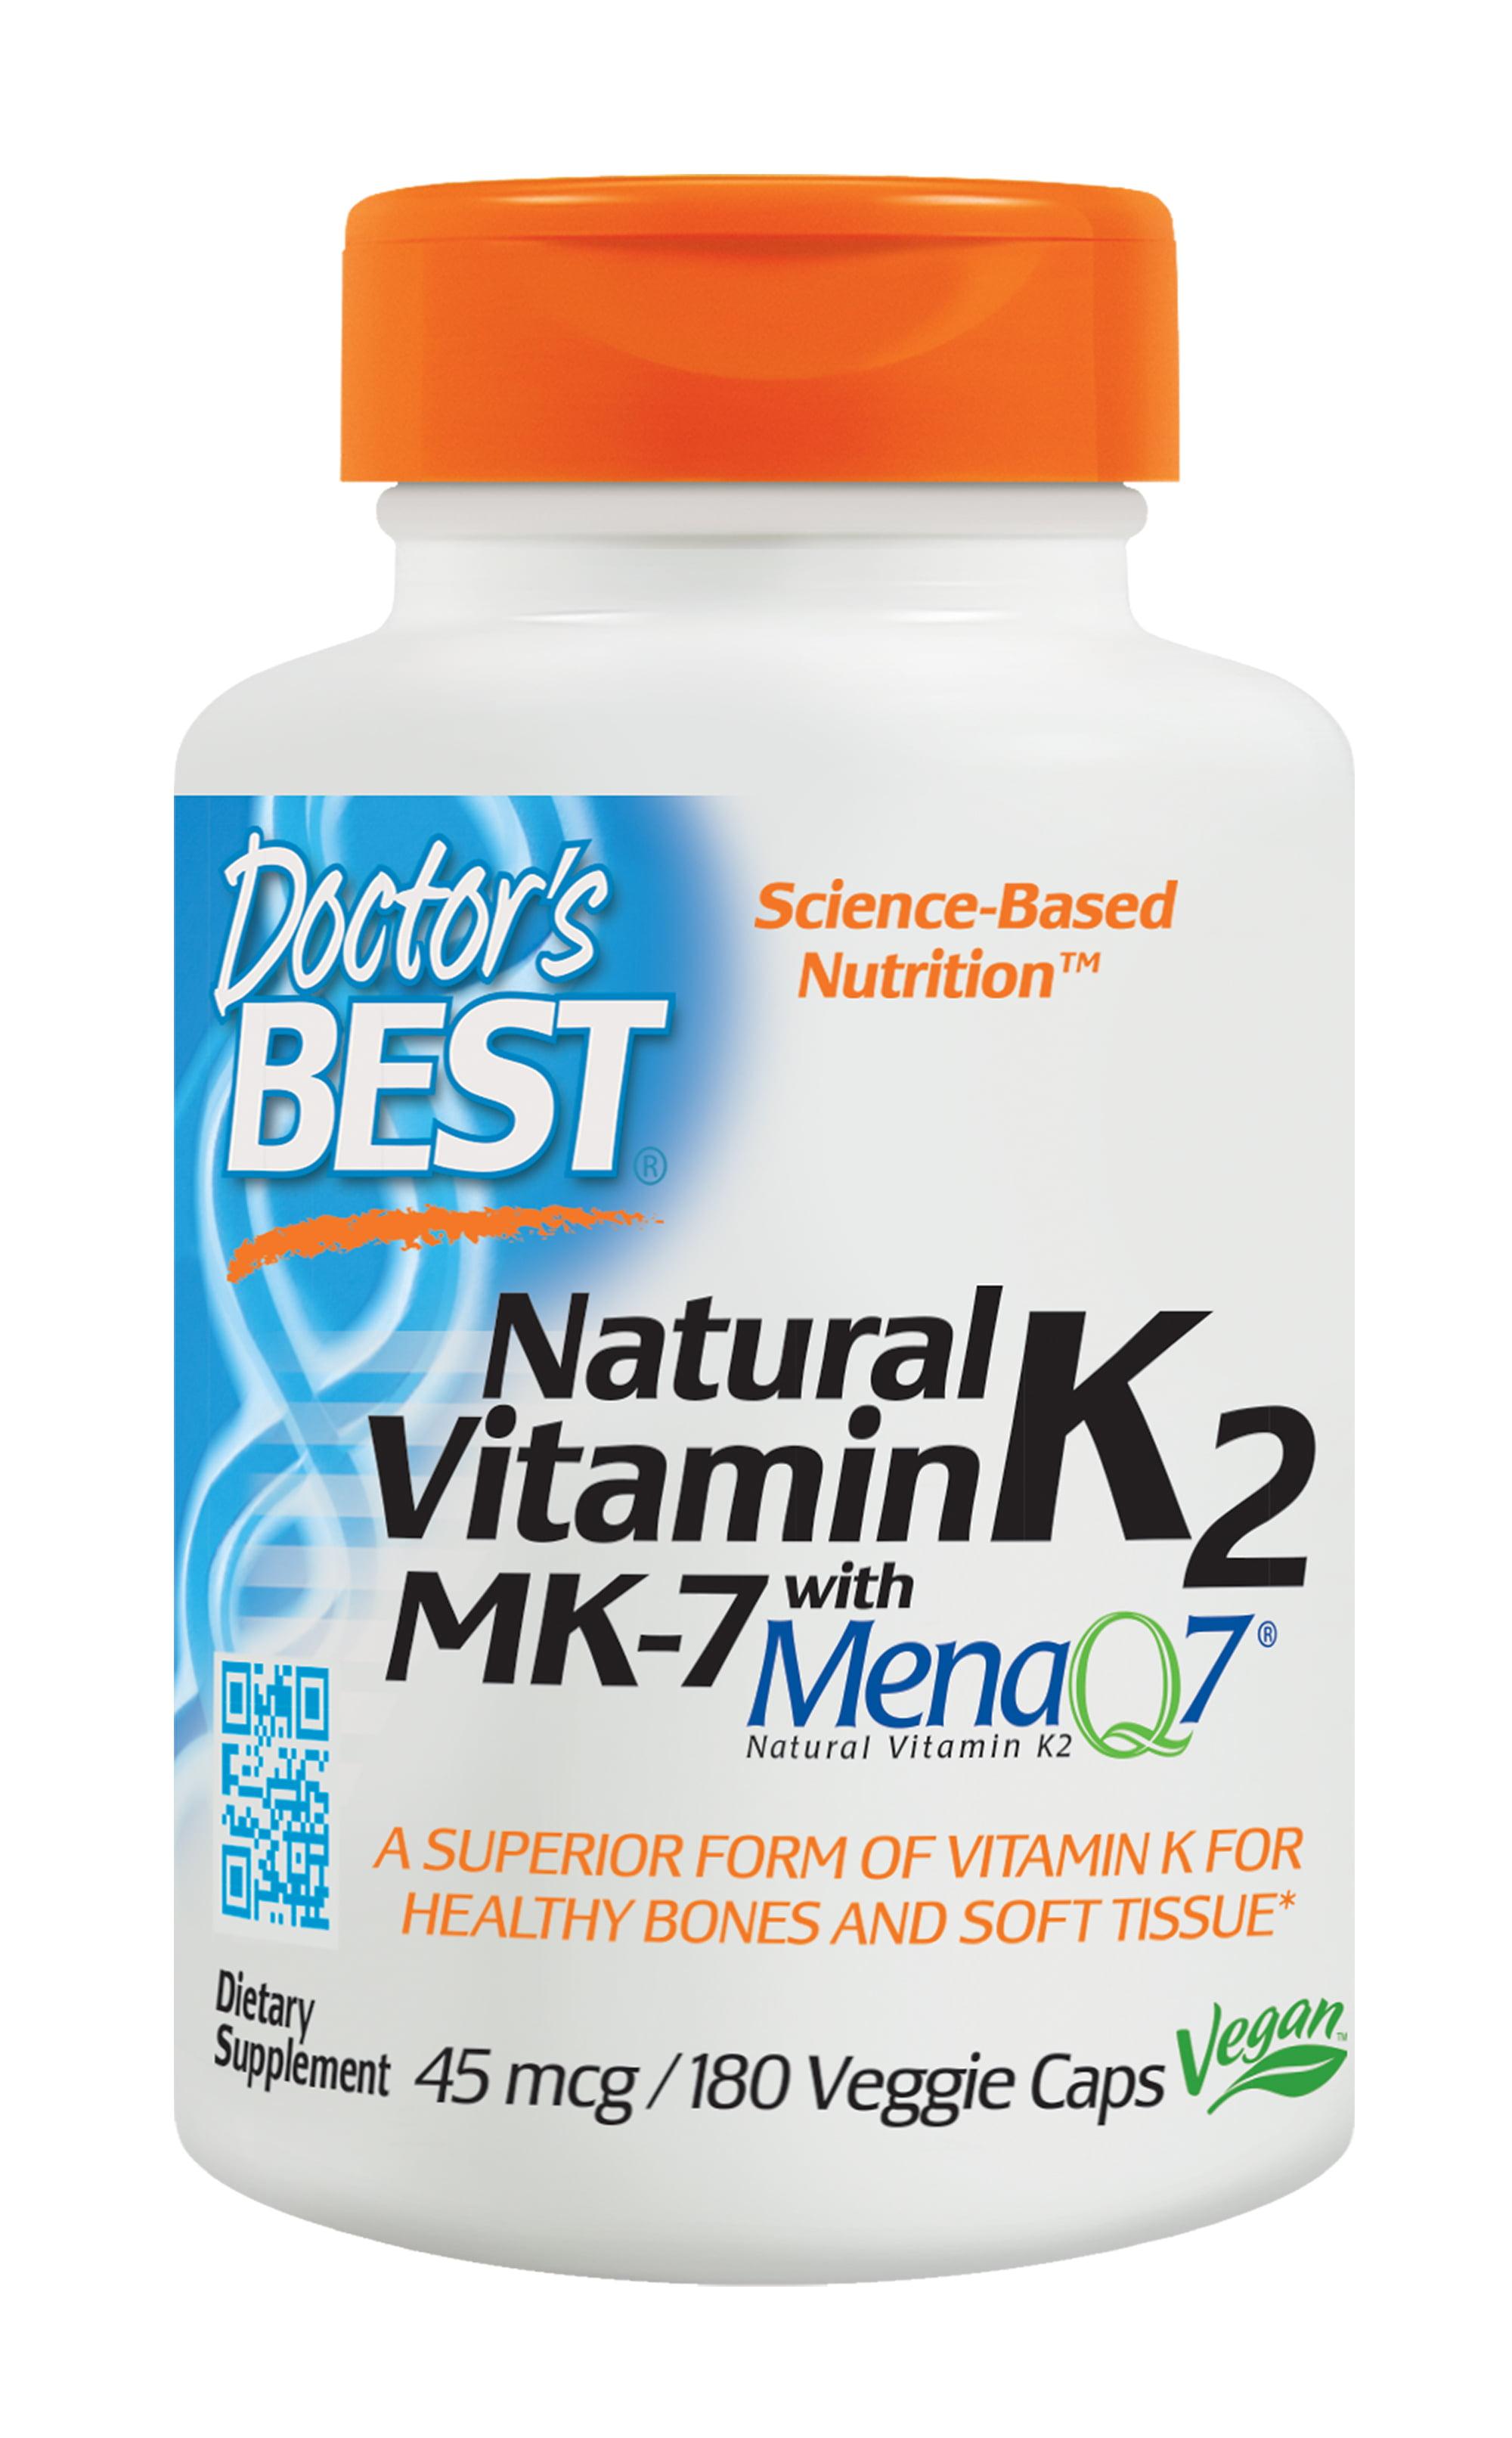 Doctor S Best Natural Vitamin K2 Mk 7 With Menaq7 Non Gmo Vegan Gluten Free Soy Free 45 Mcg 180 Veggie Caps Walmart Com Walmart Com